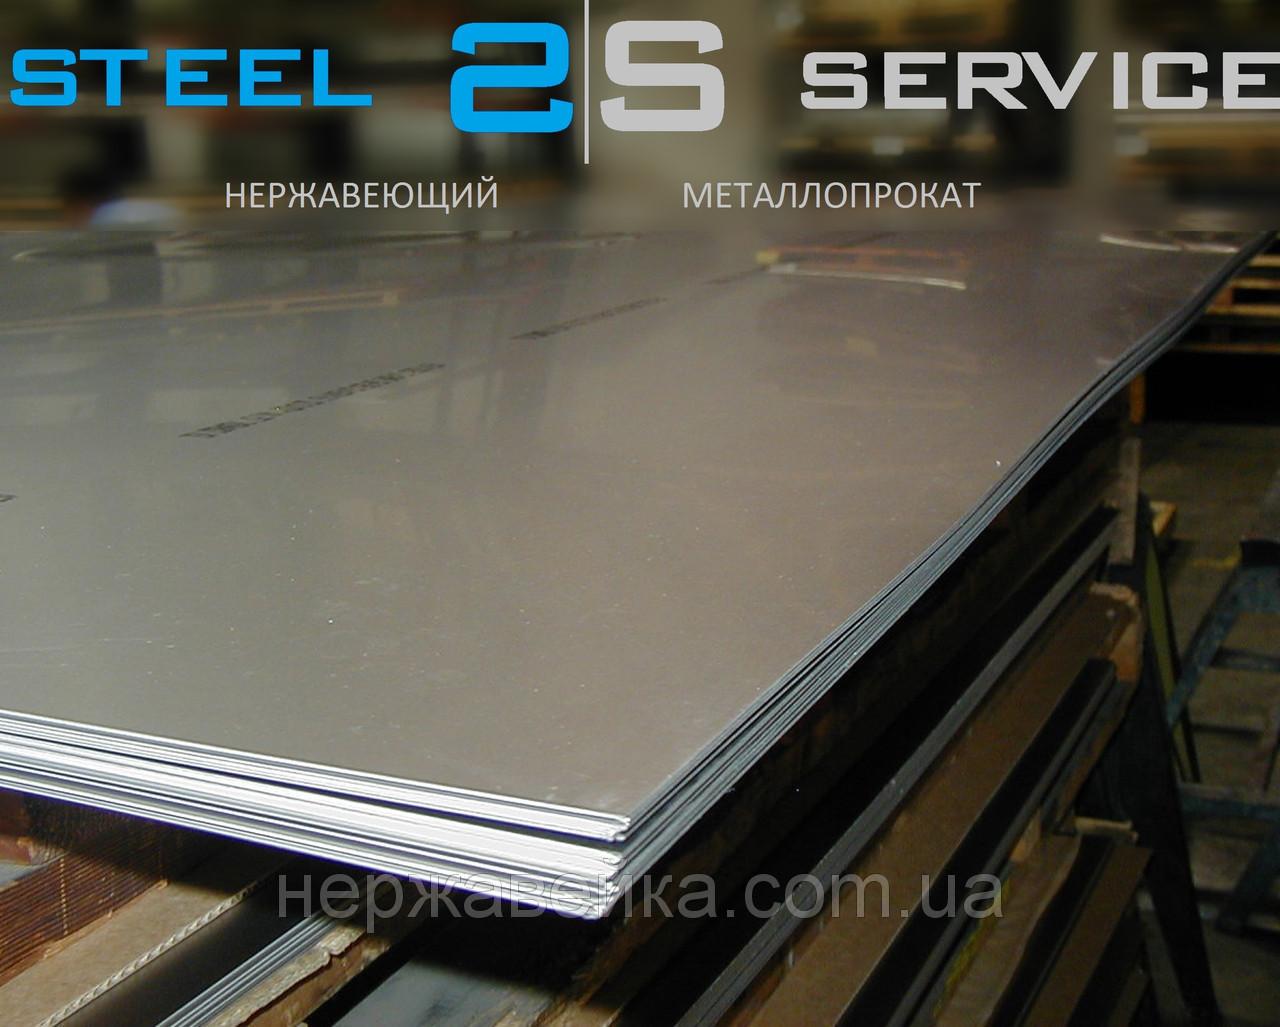 Нержавейка лист 4х1500х6000мм AISI 430(12Х17) 2B - матовый, технический